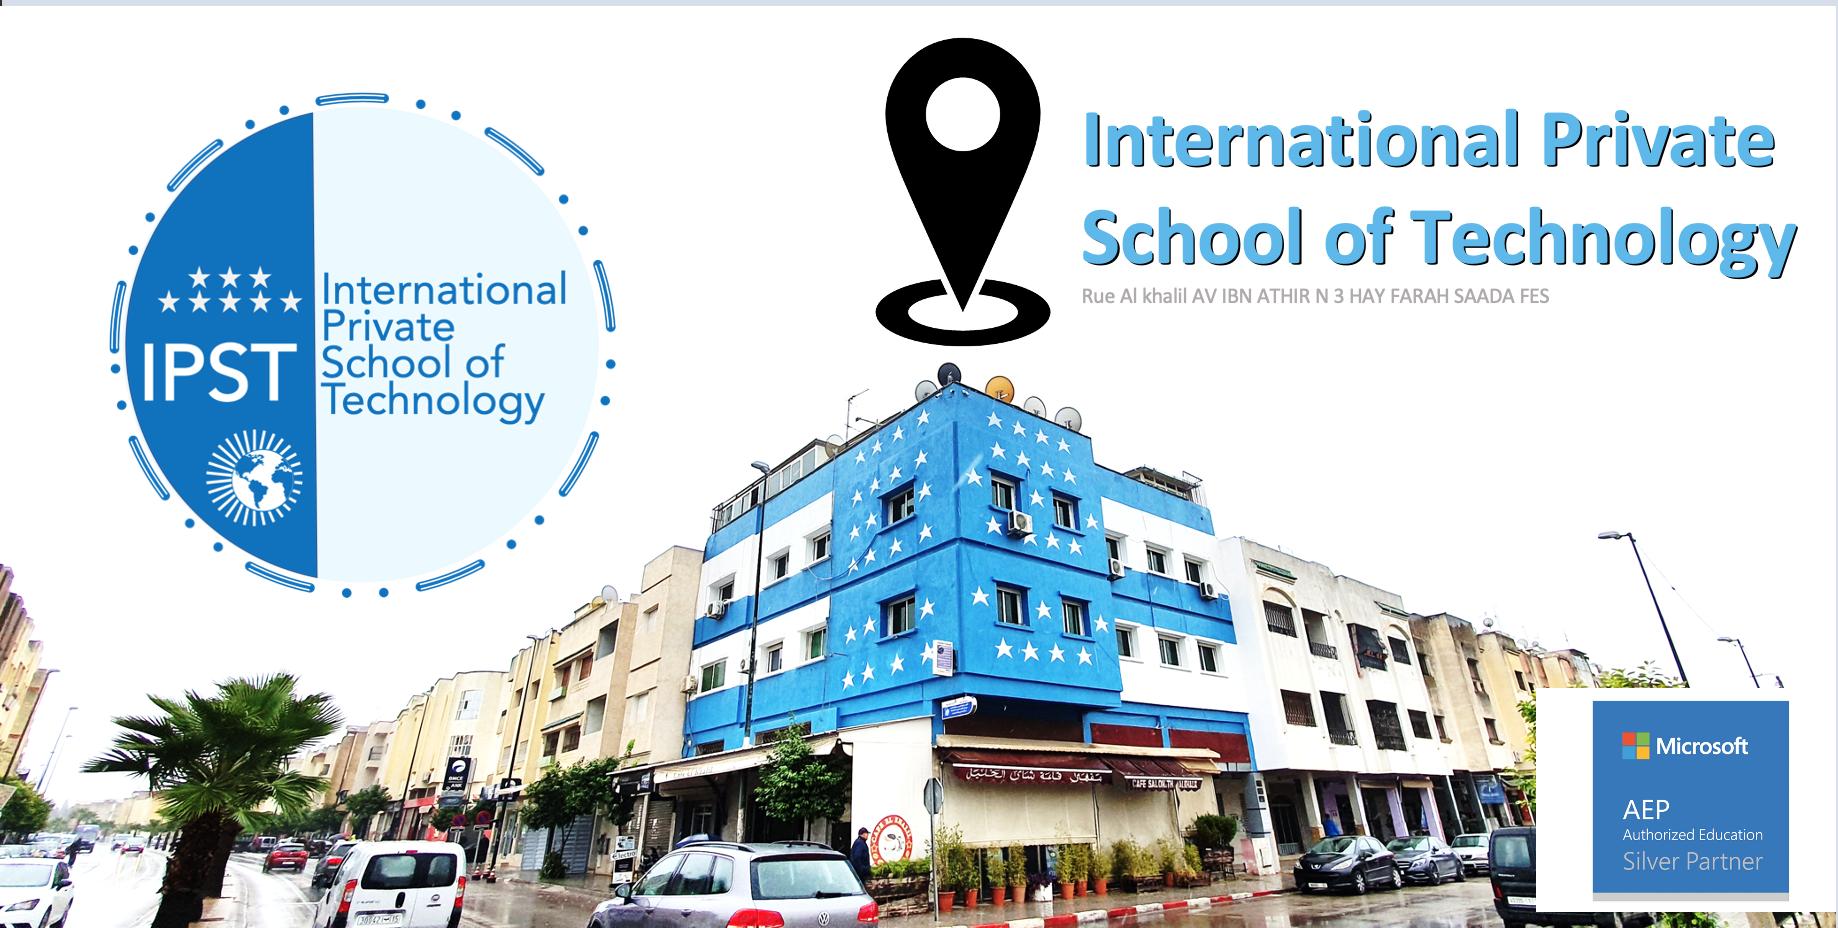 IPST (International Private School of Technology)